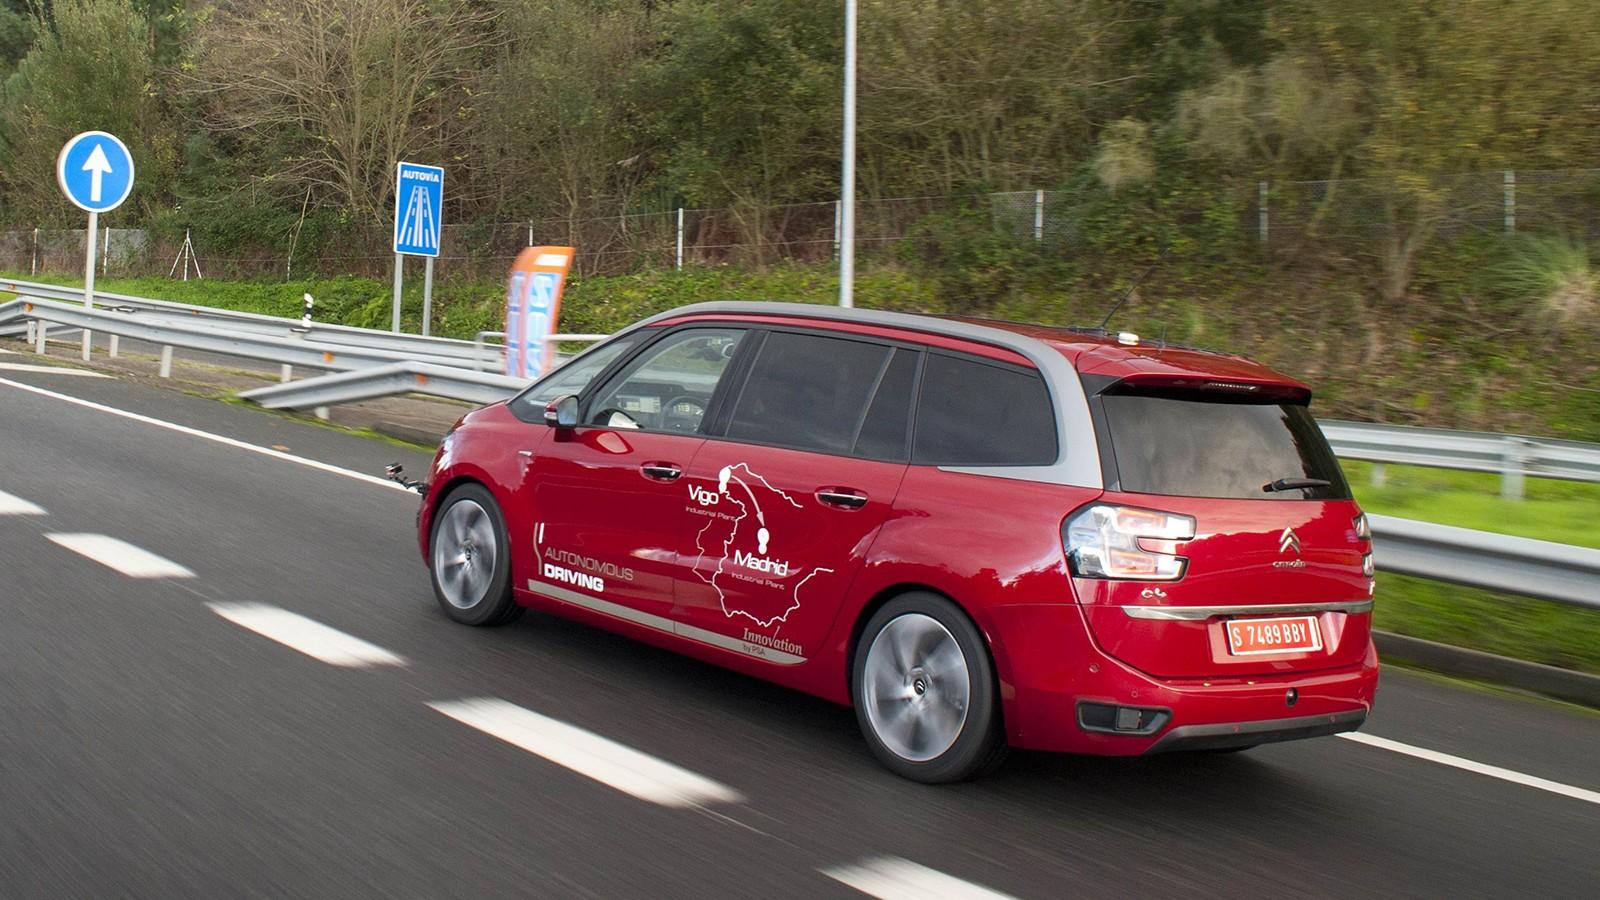 vehicule_autonome_road_0